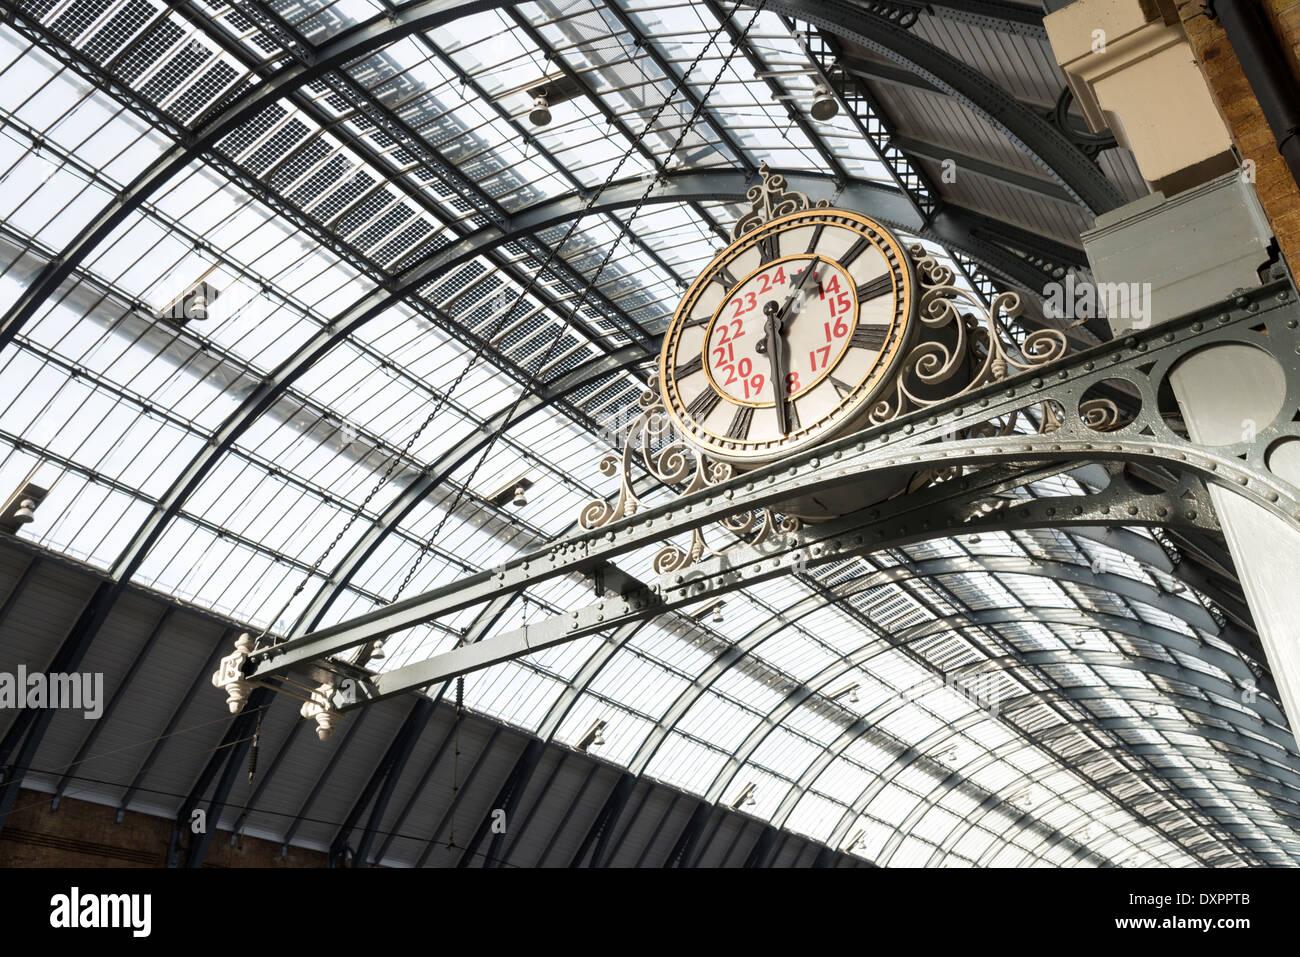 King's Cross station clock, London, England, UK - Stock Image